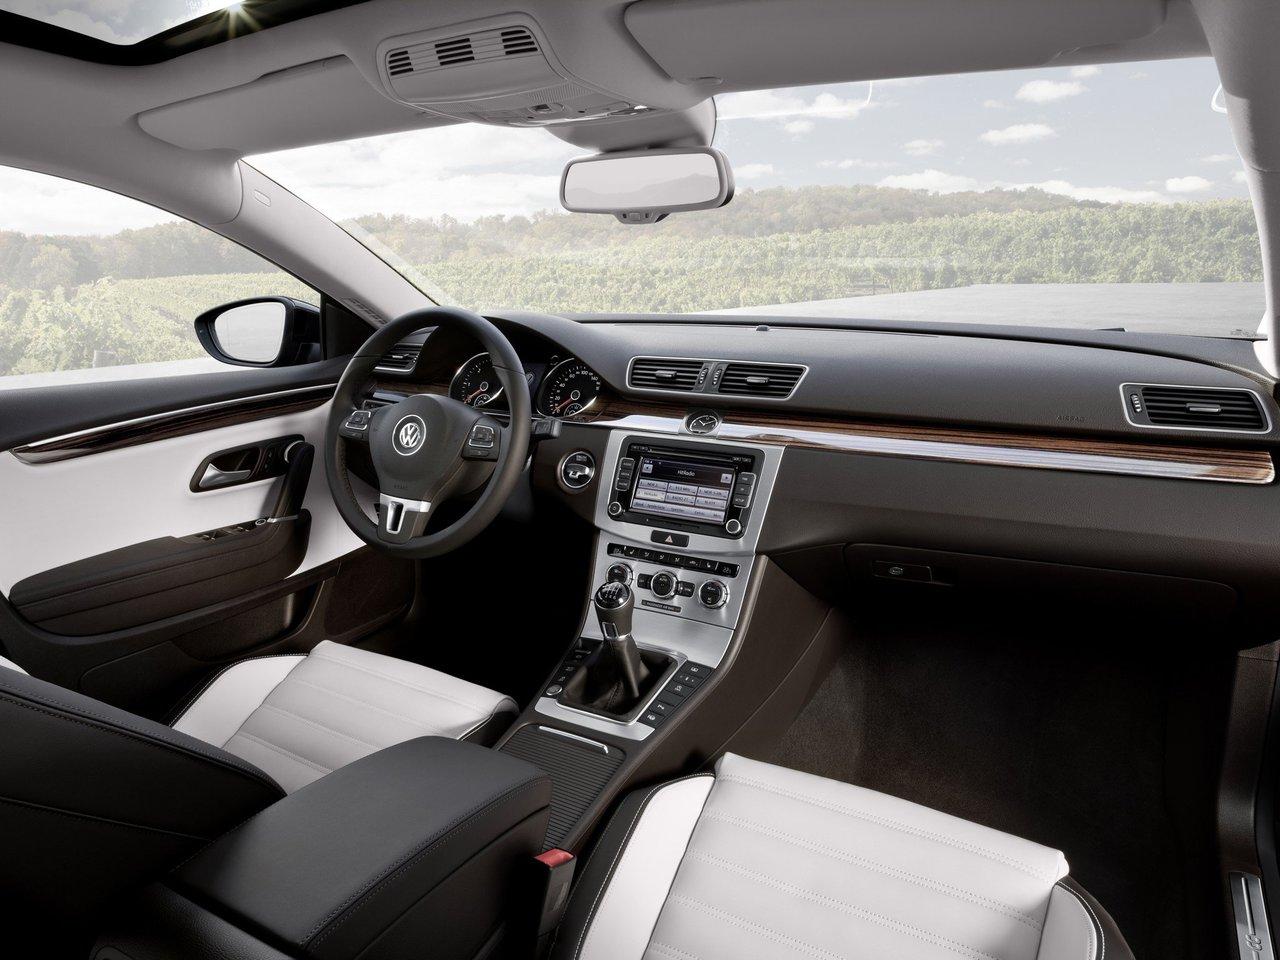 Снимки: Volkswagen CC Facelift